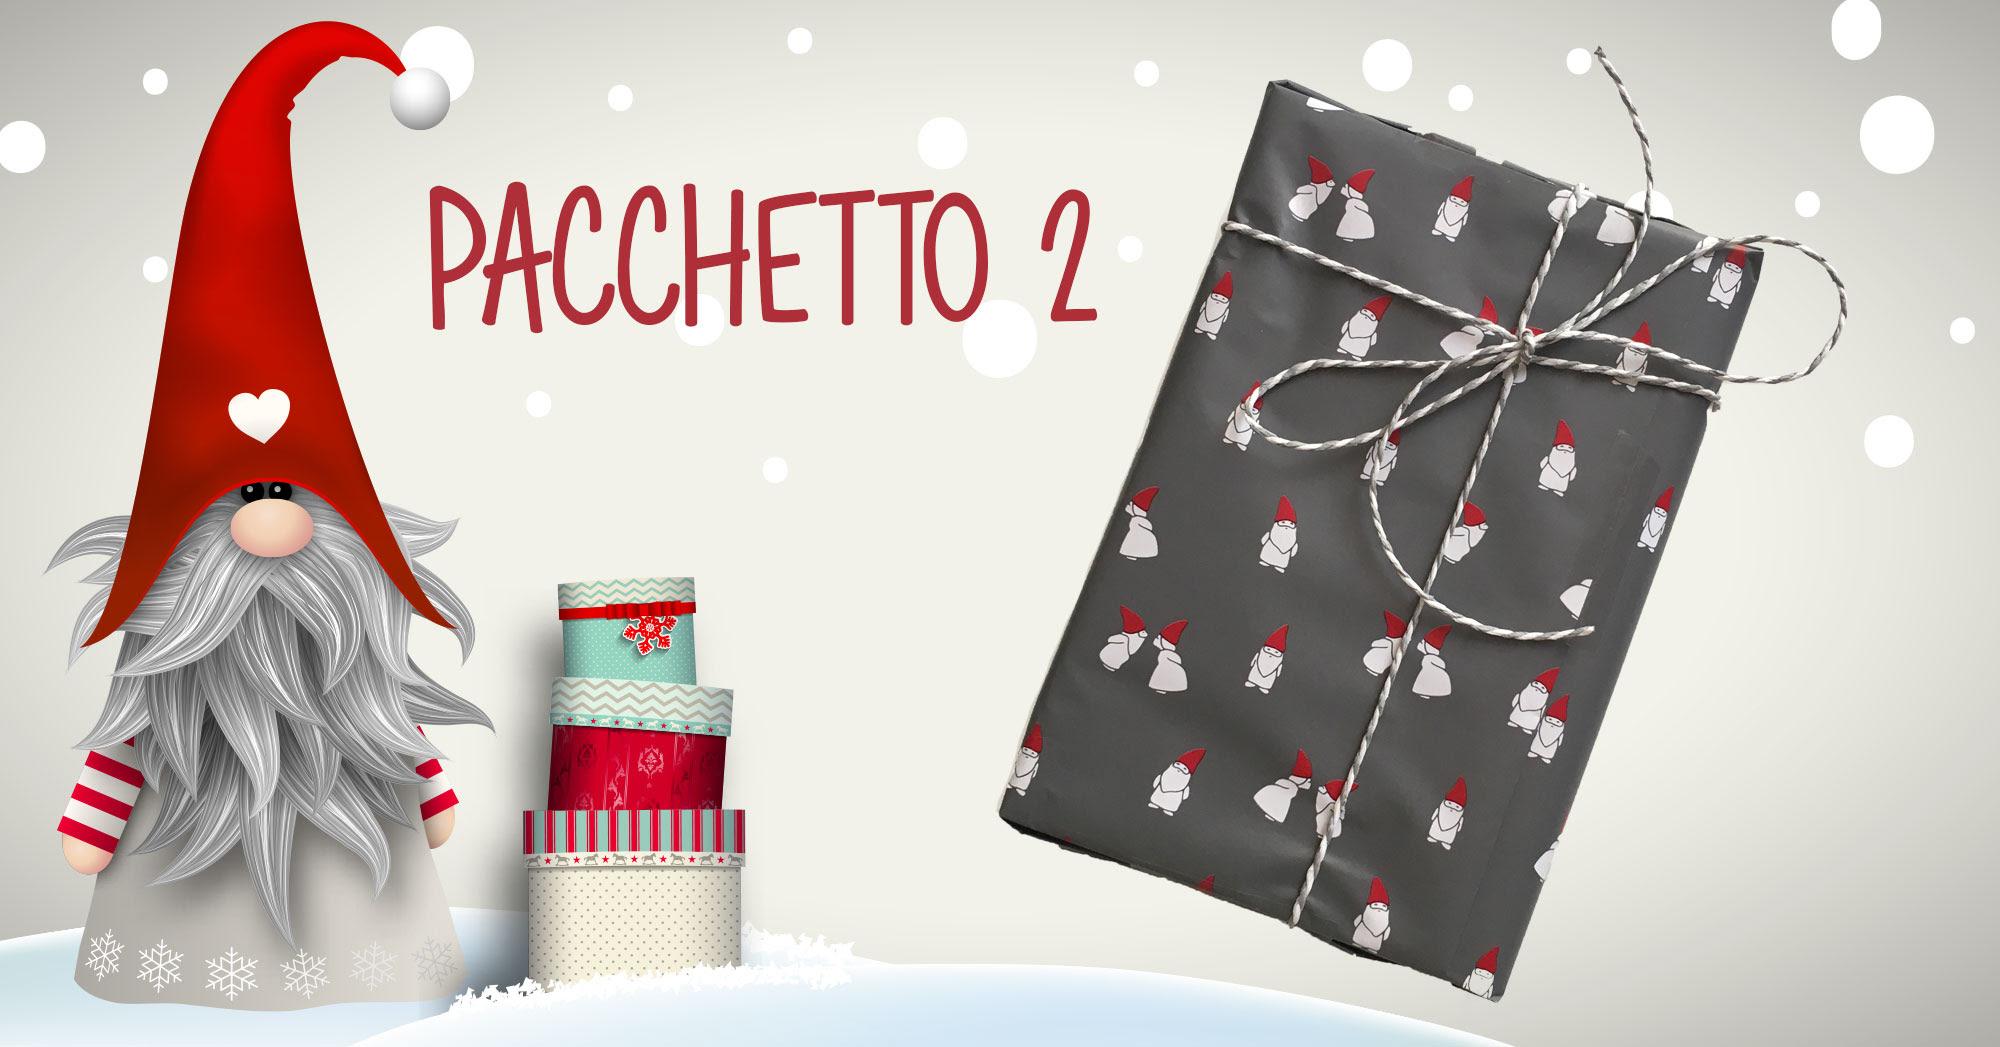 Pacchetto 2